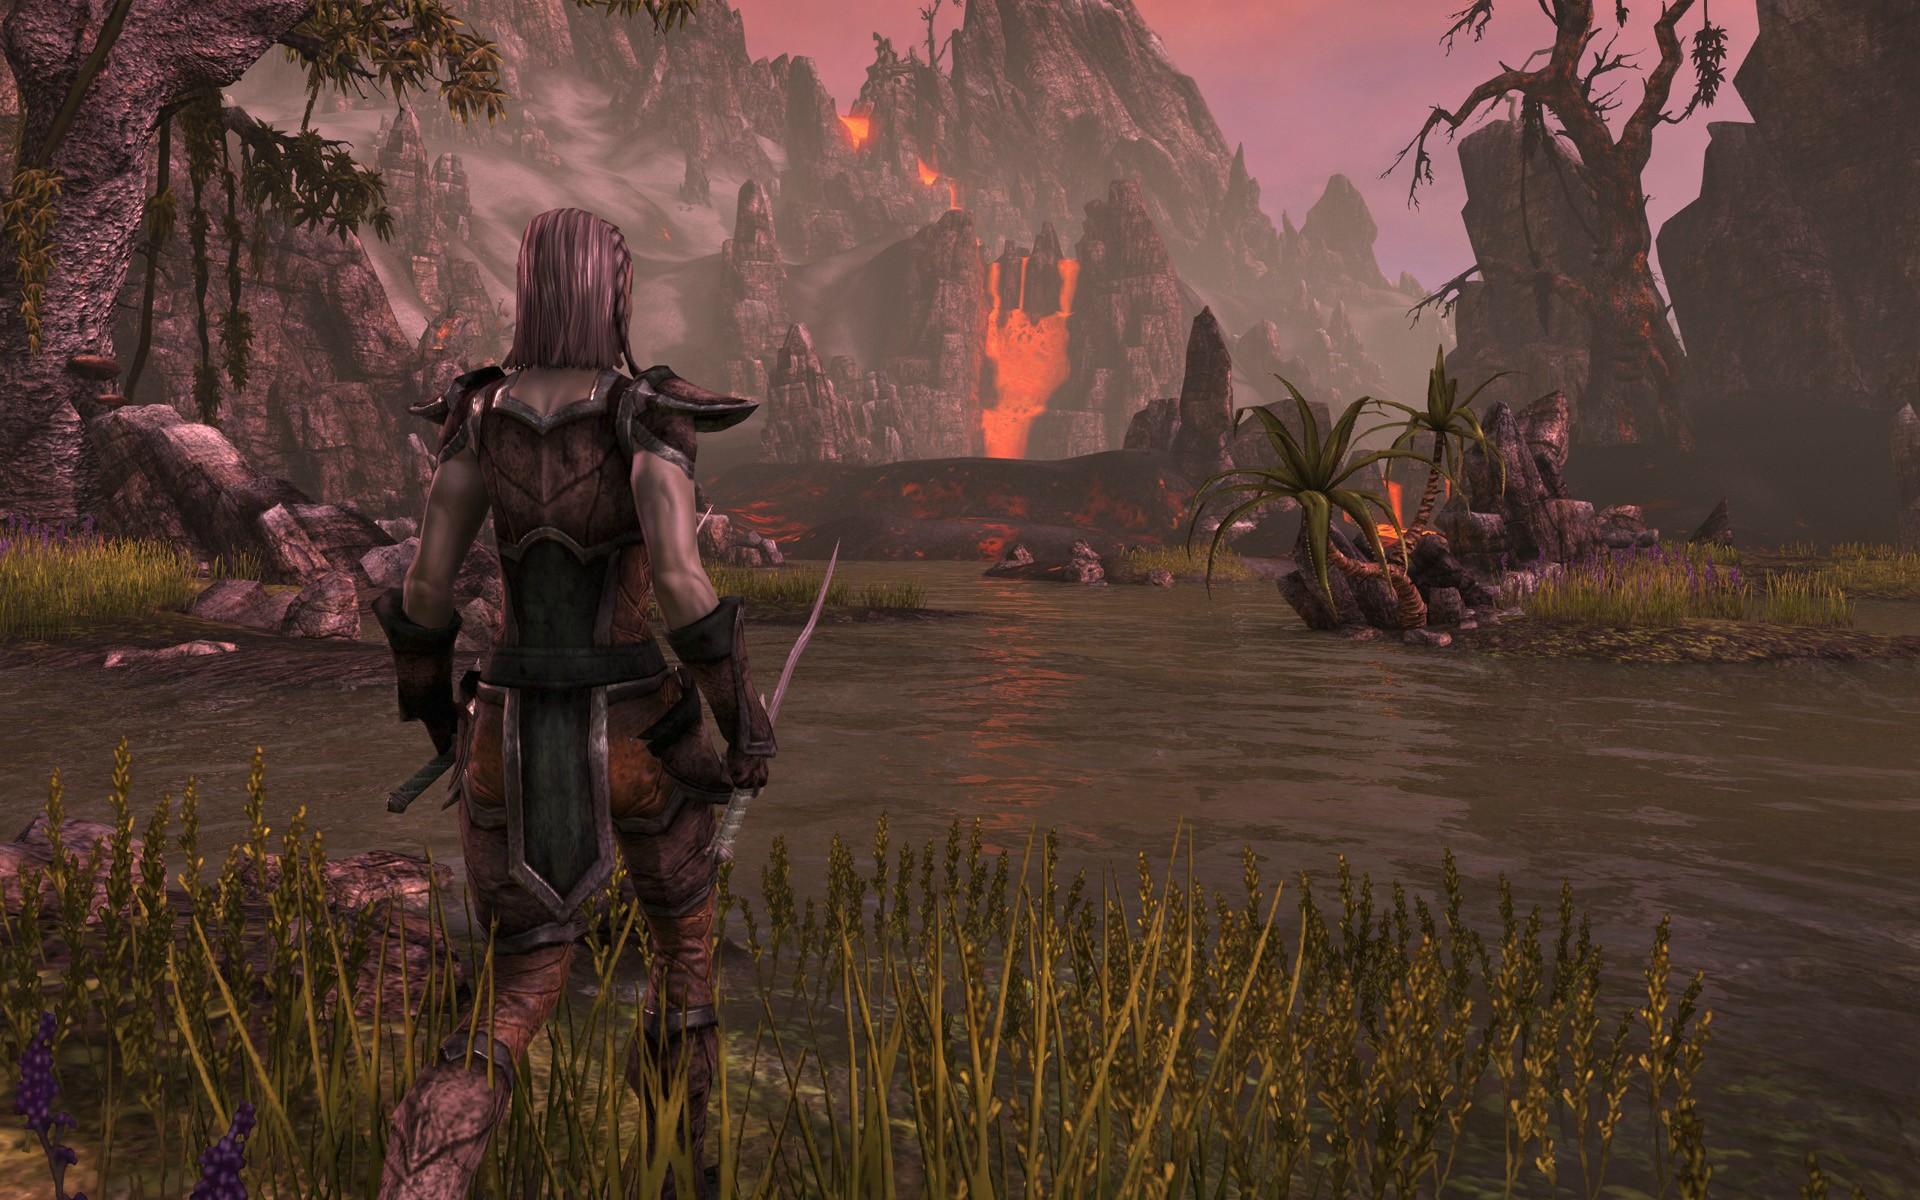 Elder Scrolls Online Screenshots Travel Across Tamriel #24406